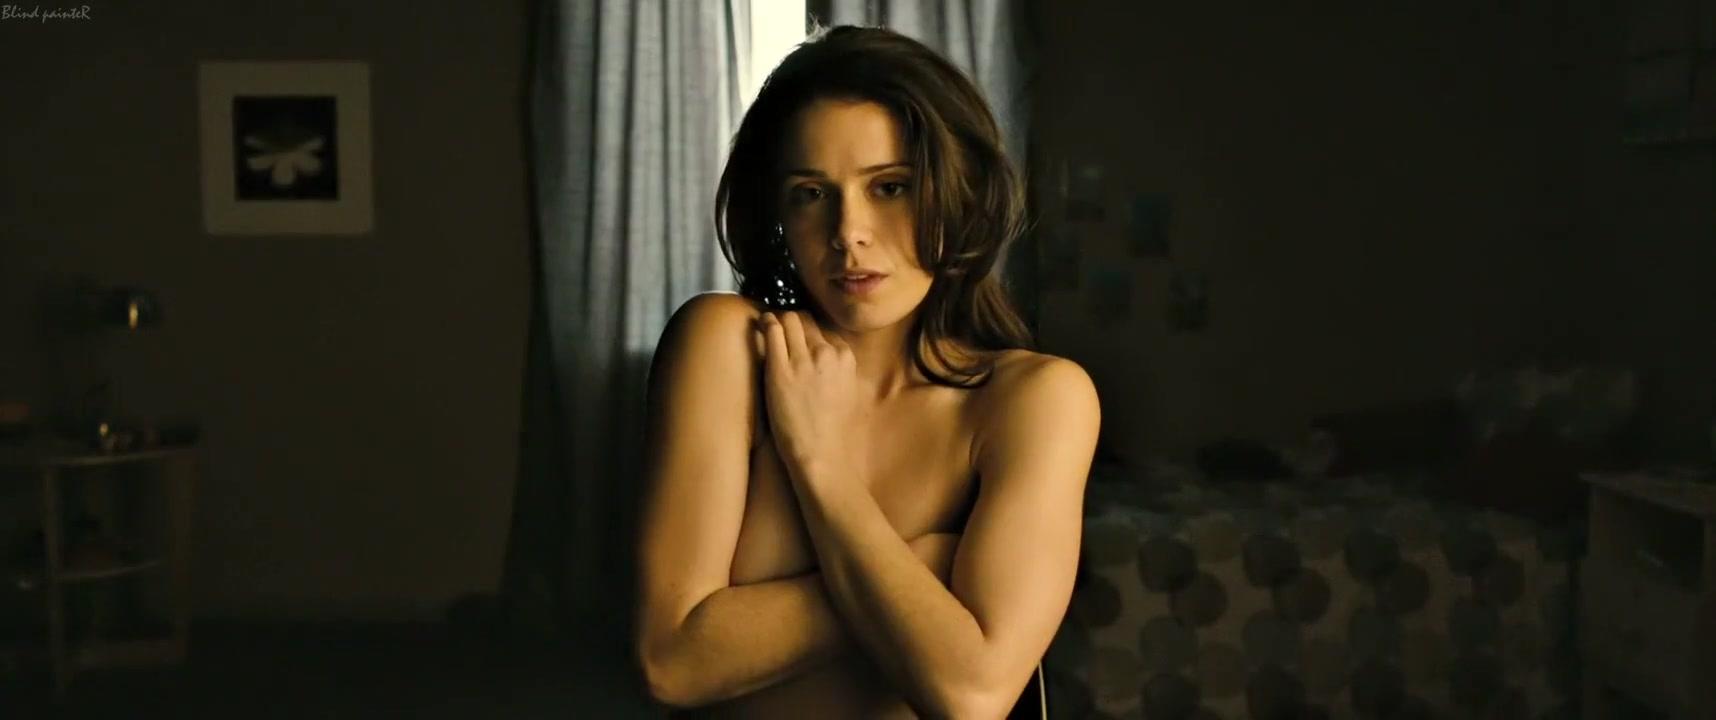 Naked Pictures Big tits pornstar kyla kox